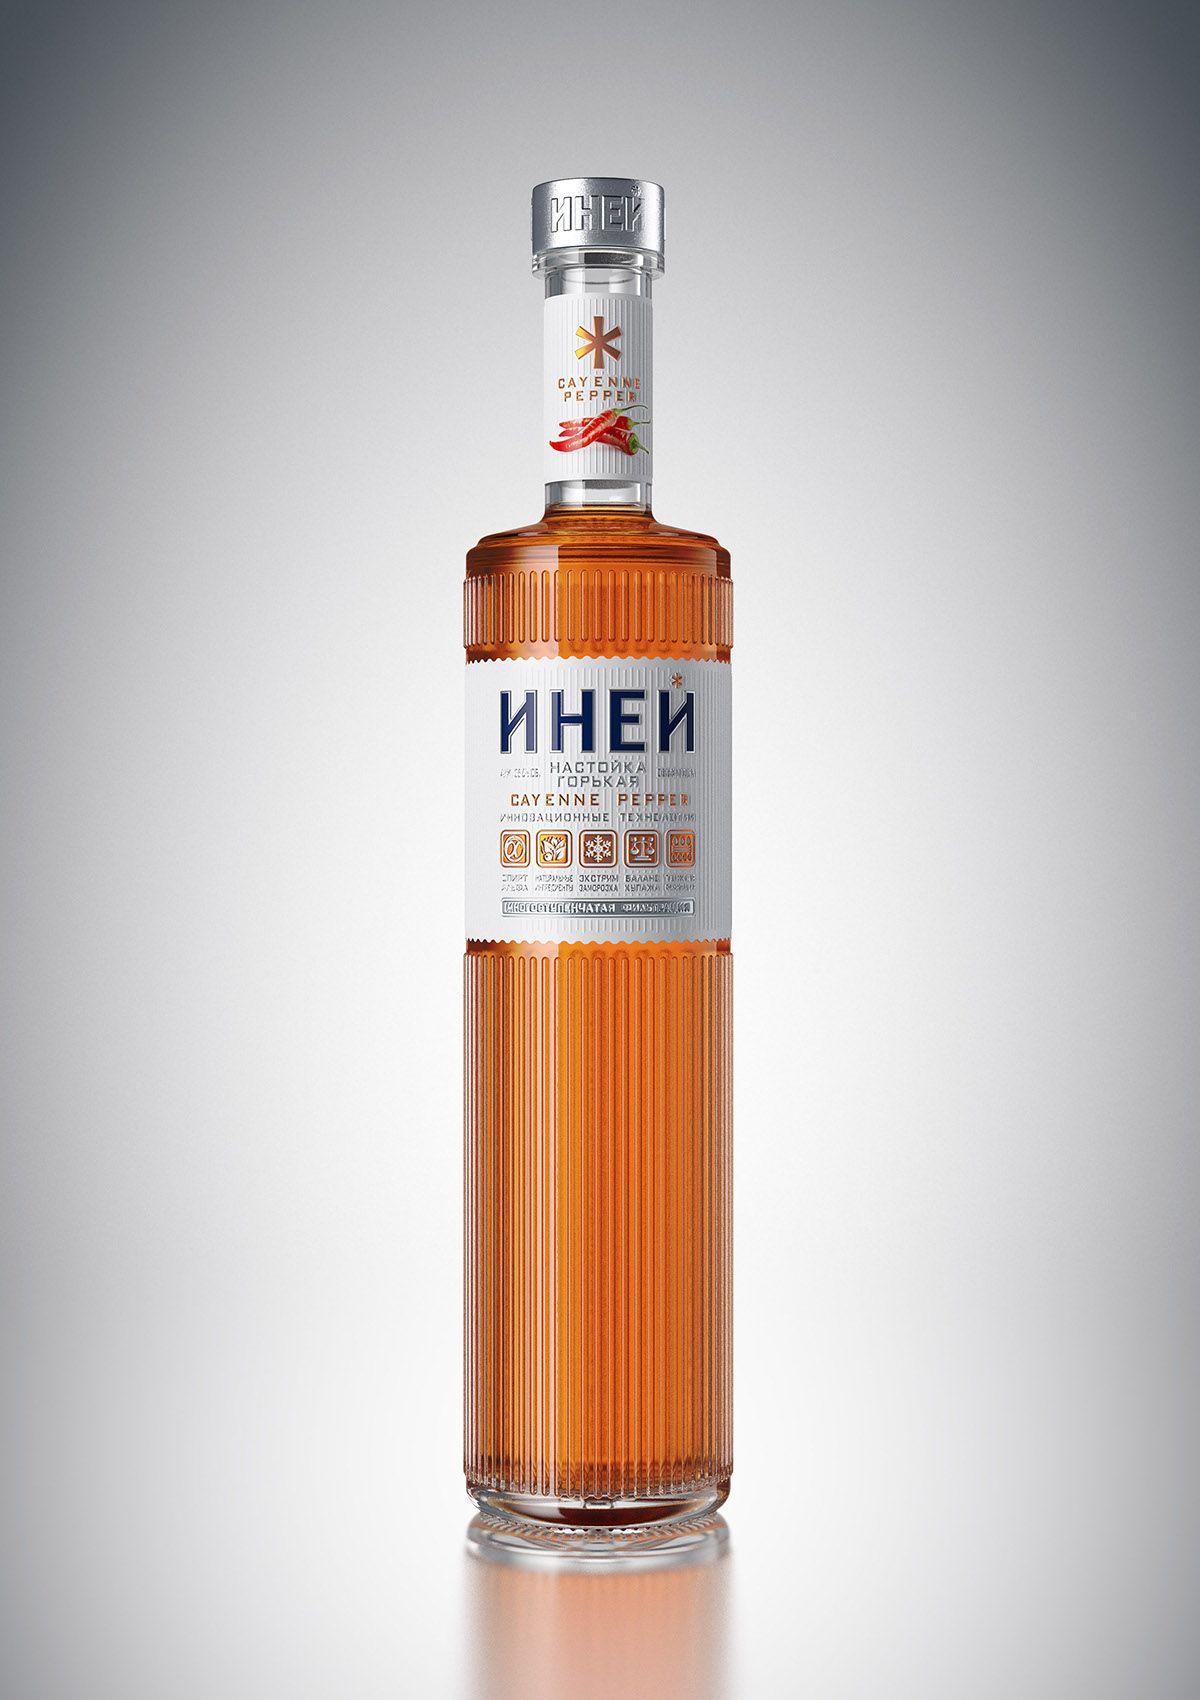 Vodka alcohol pinterest packaging design and package design vodka malvernweather Choice Image